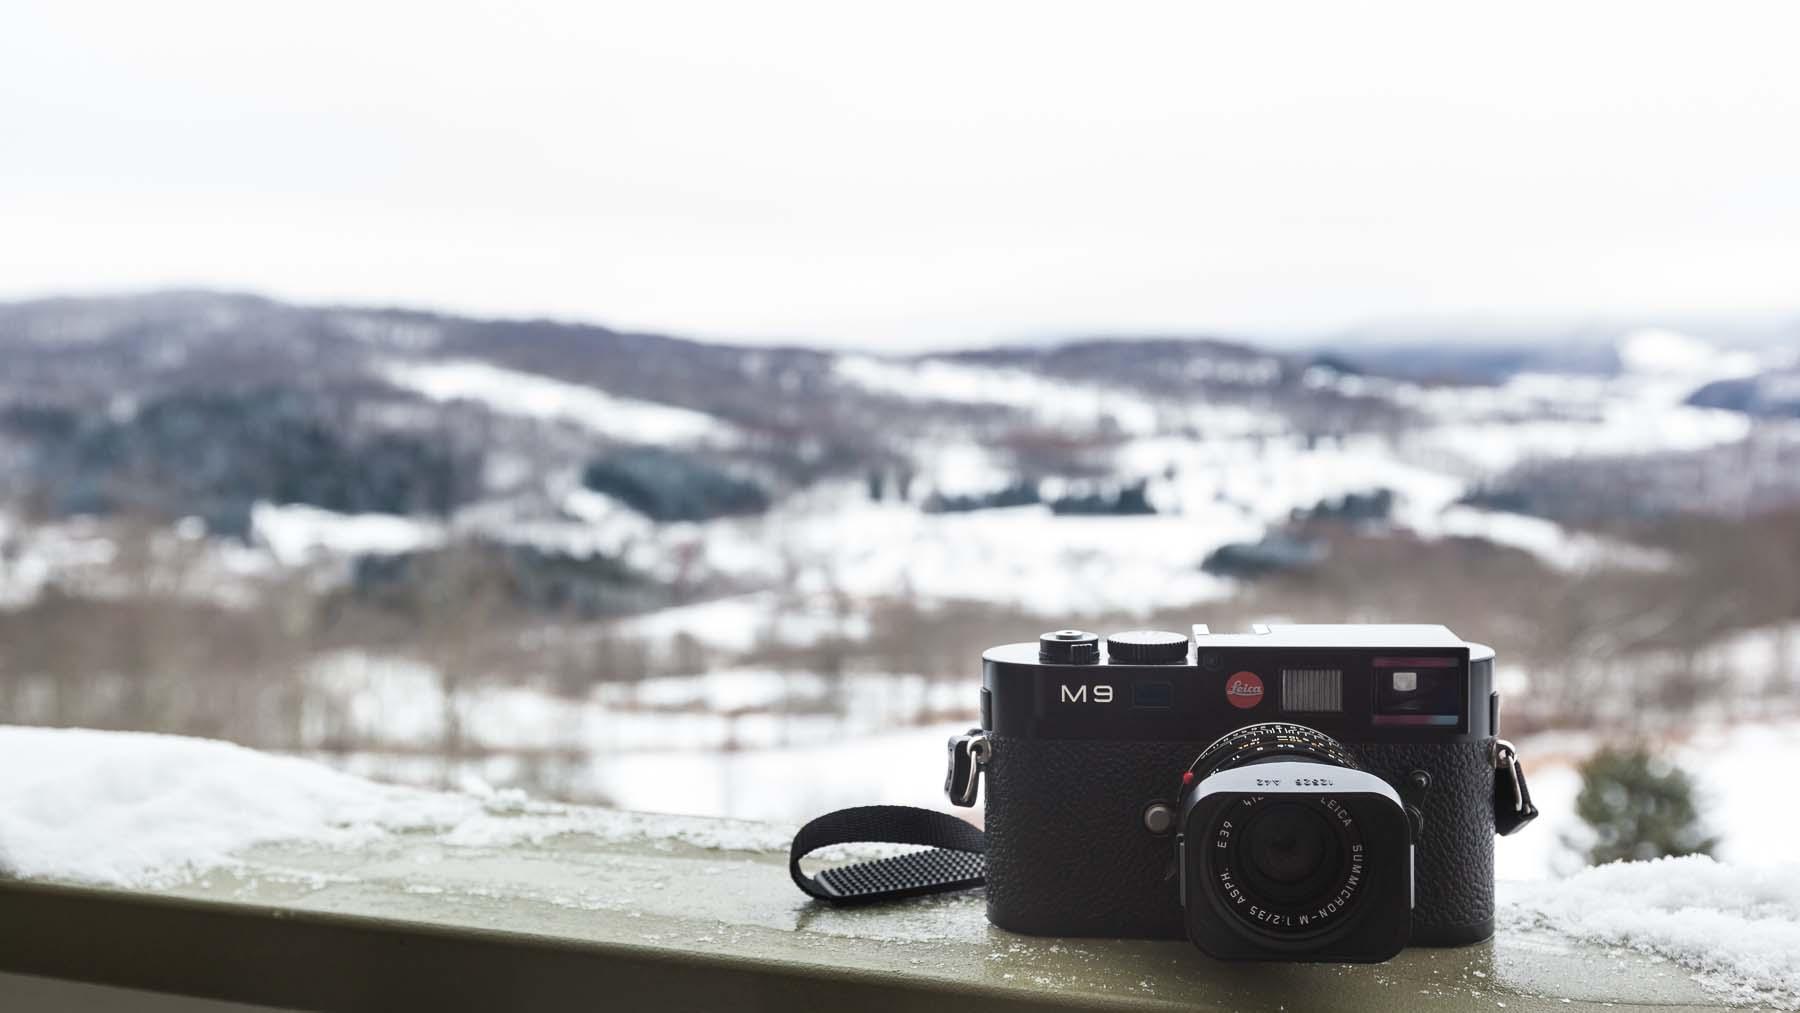 The Leica M9, as a pro-hobbyist photographer